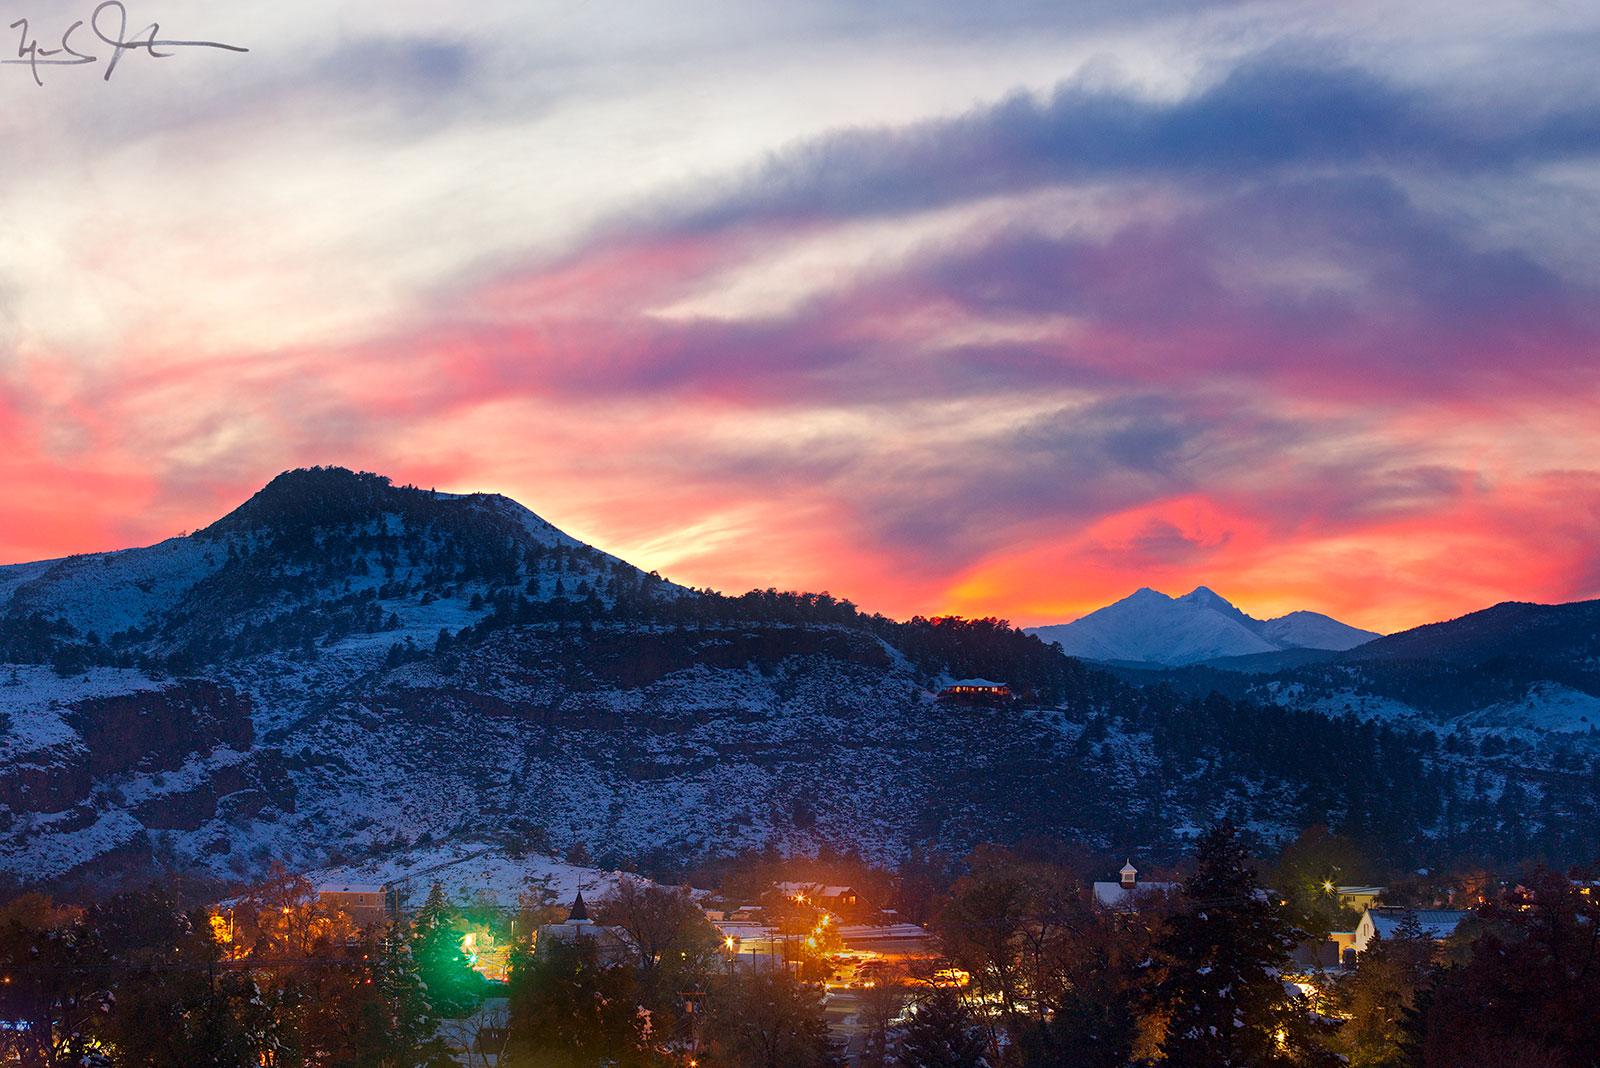 Winter sunset over Lyons, Colorado.